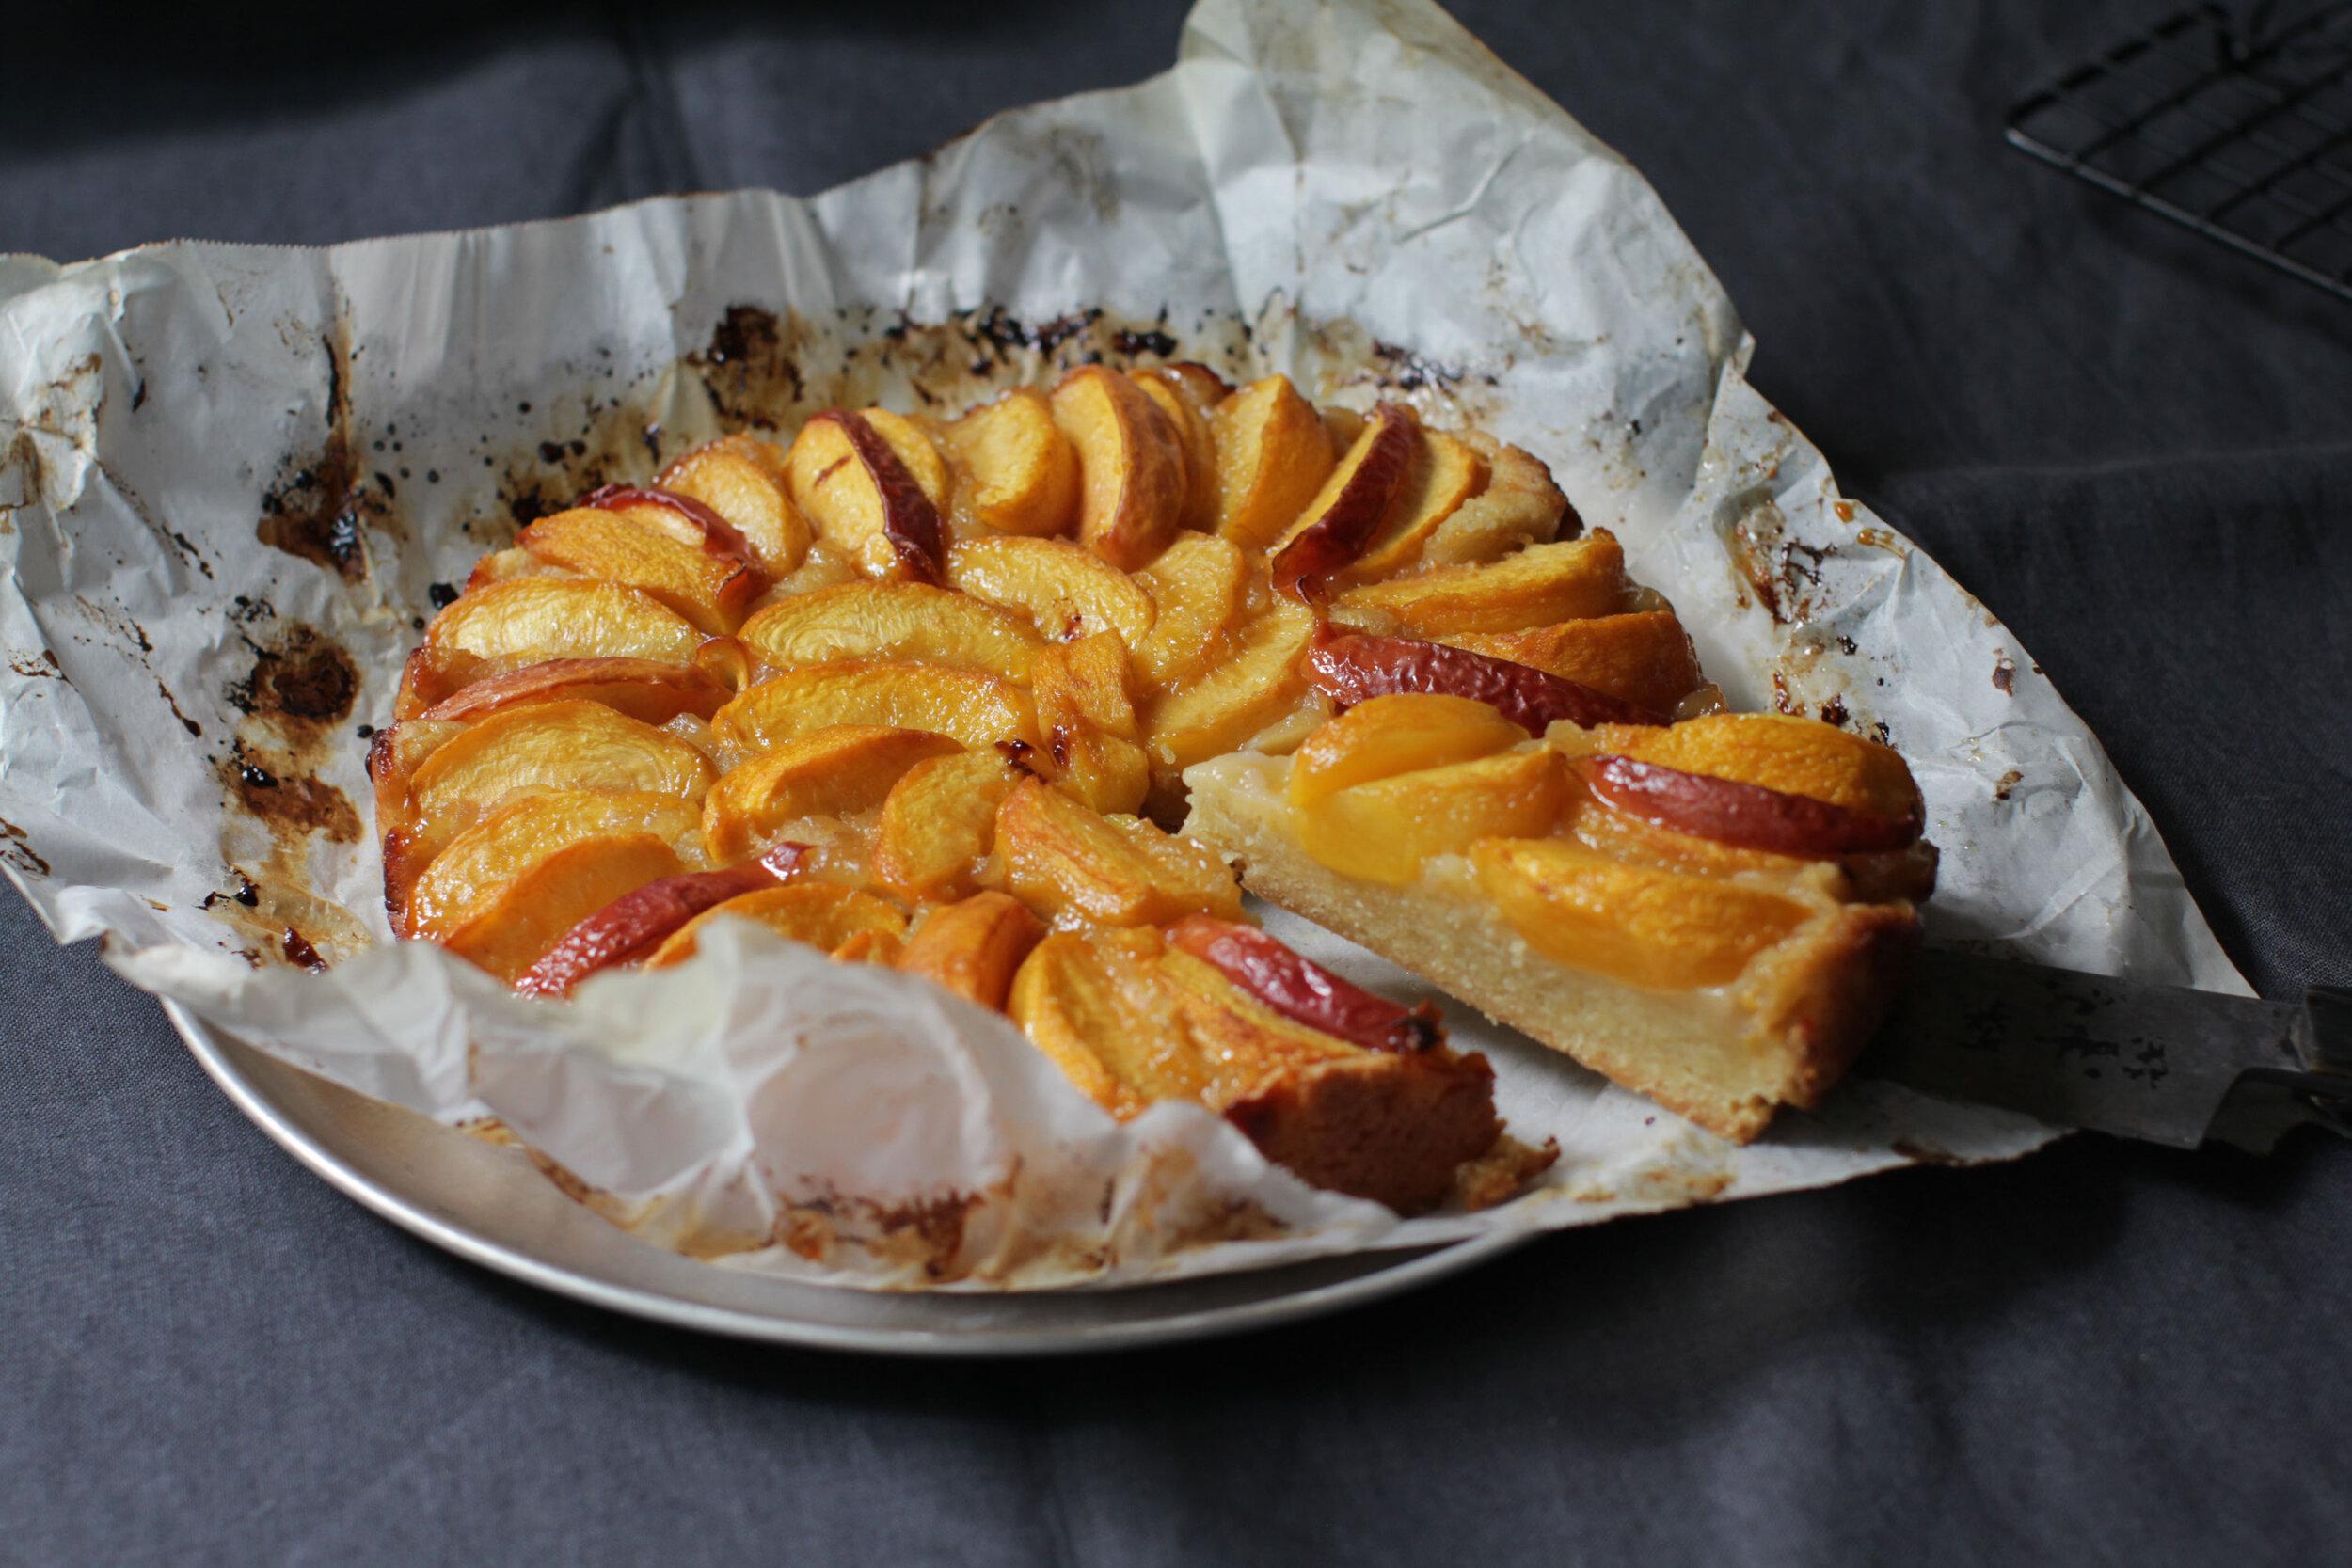 QC-autre-tarte-aux-peches-3.jpg